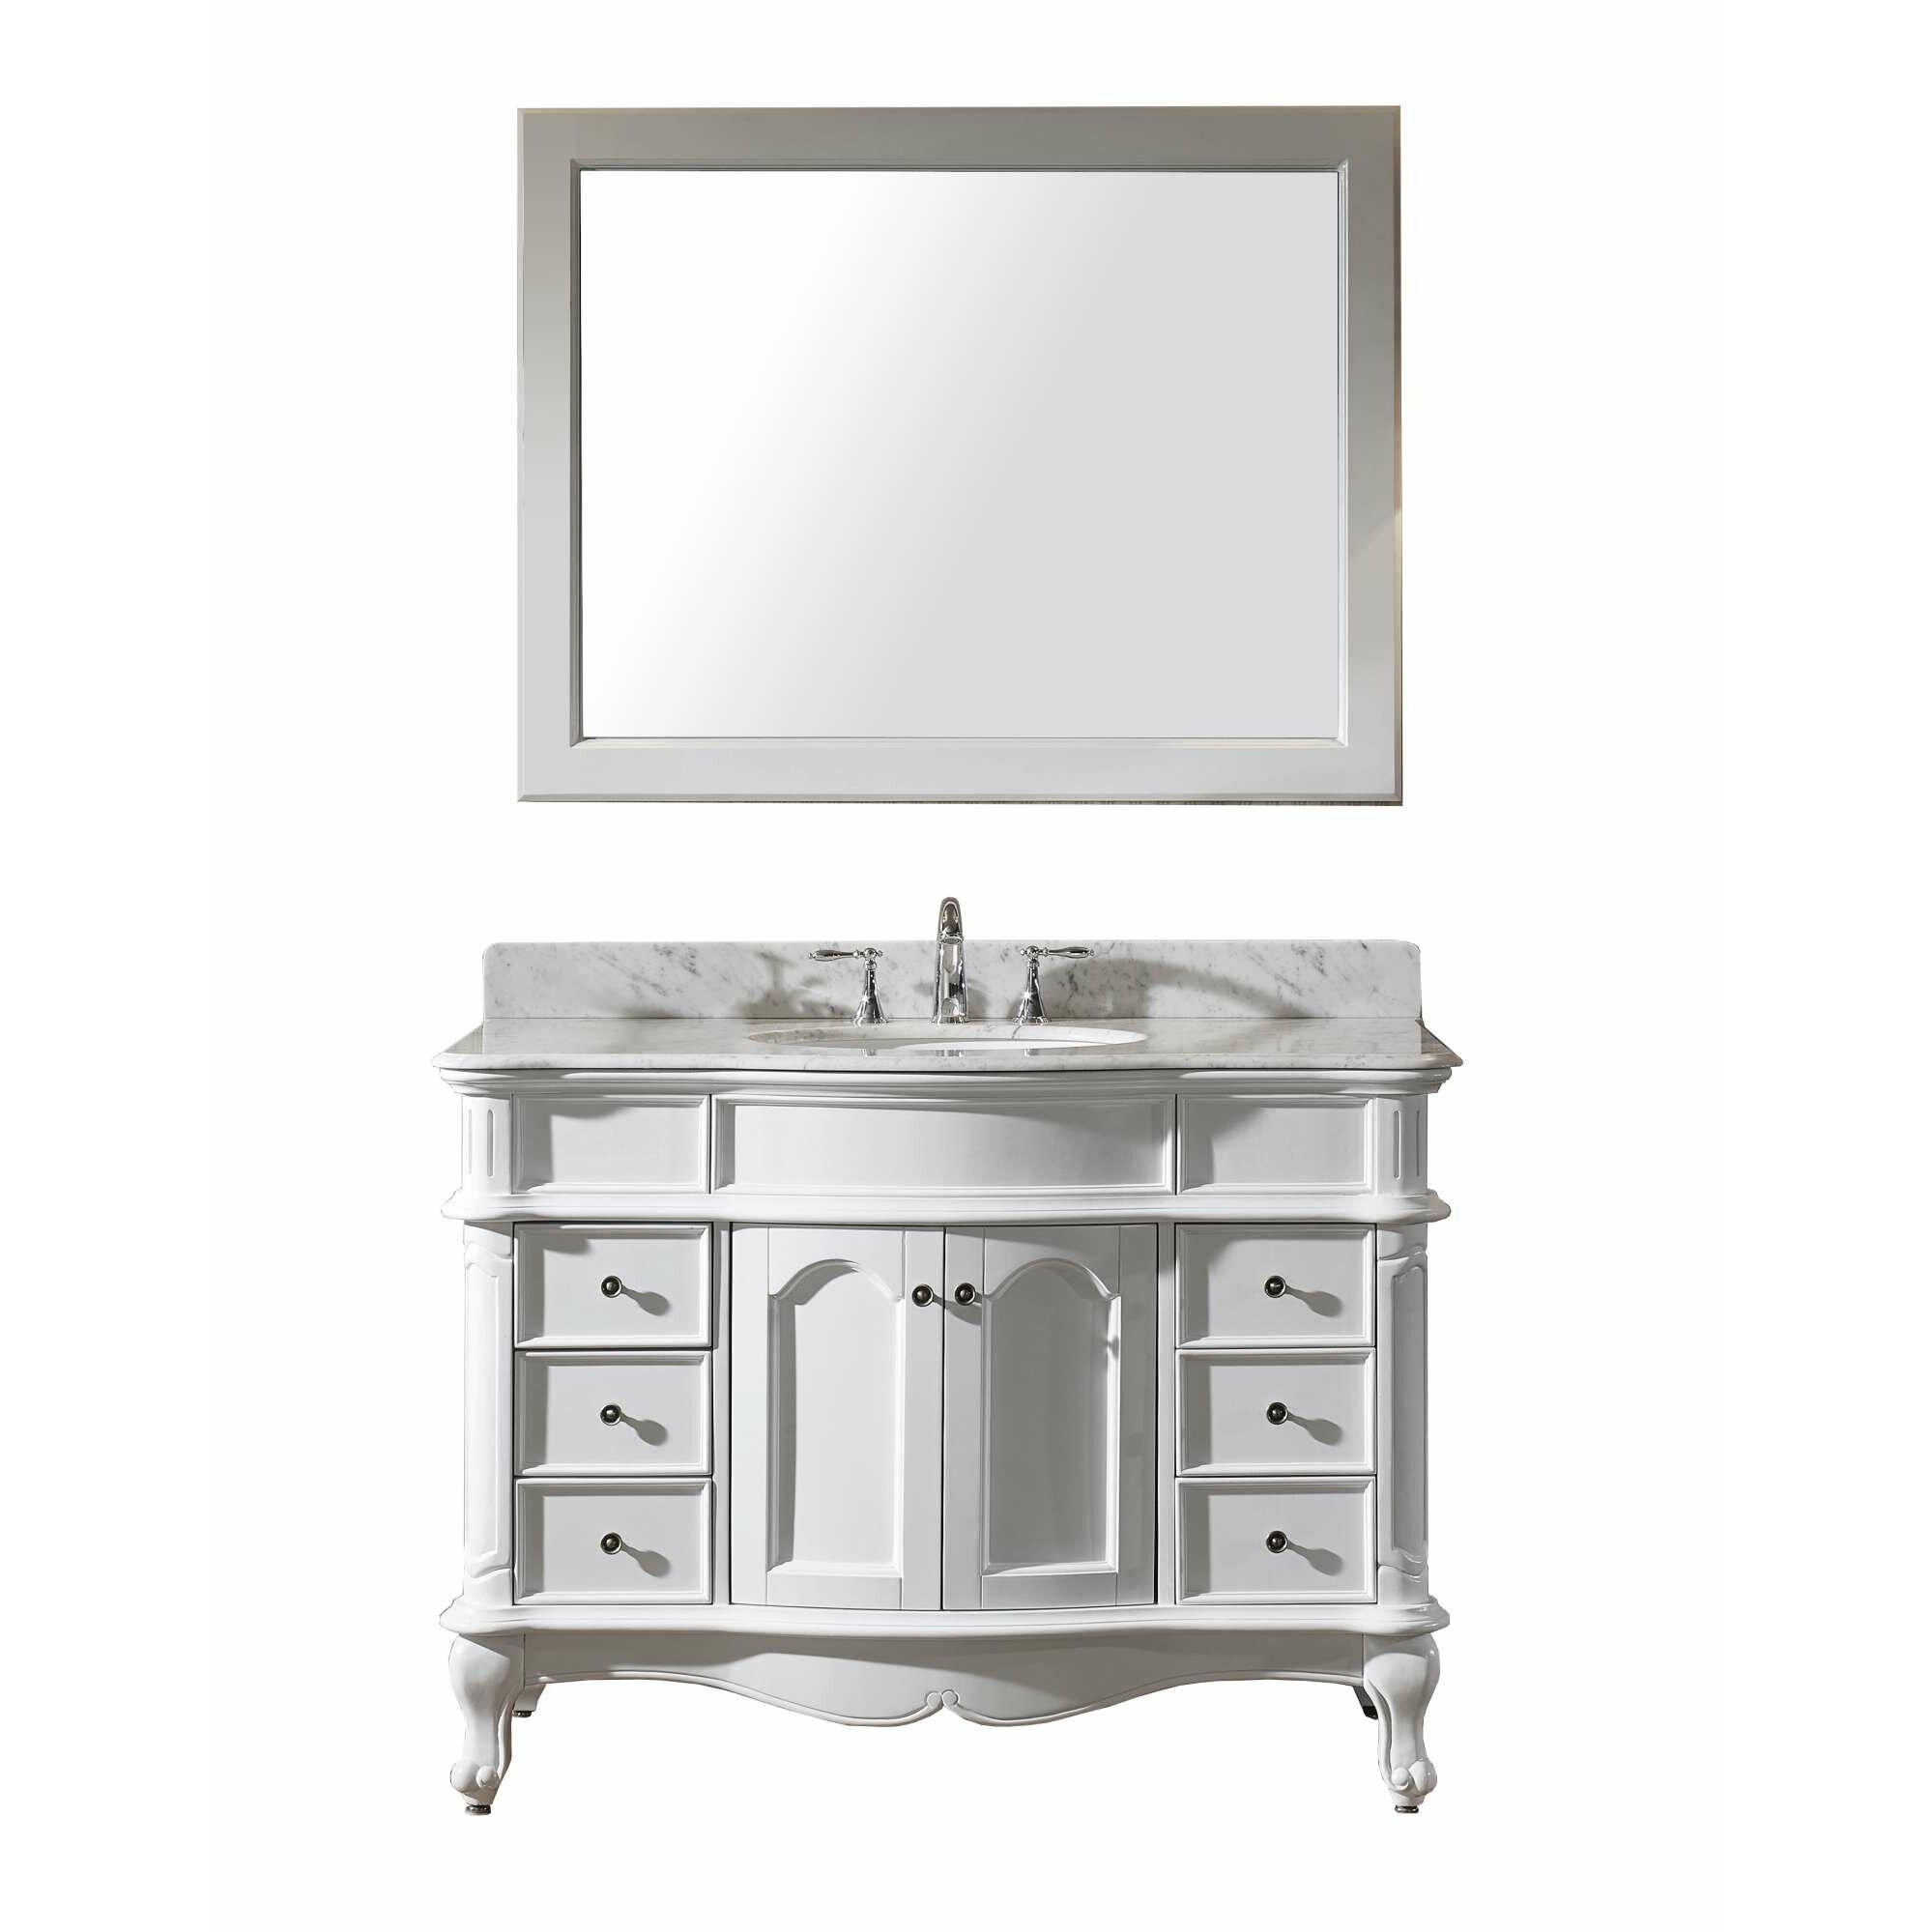 Virtu Norhaven 48 Single Bathroom Vanity Set With Mirror